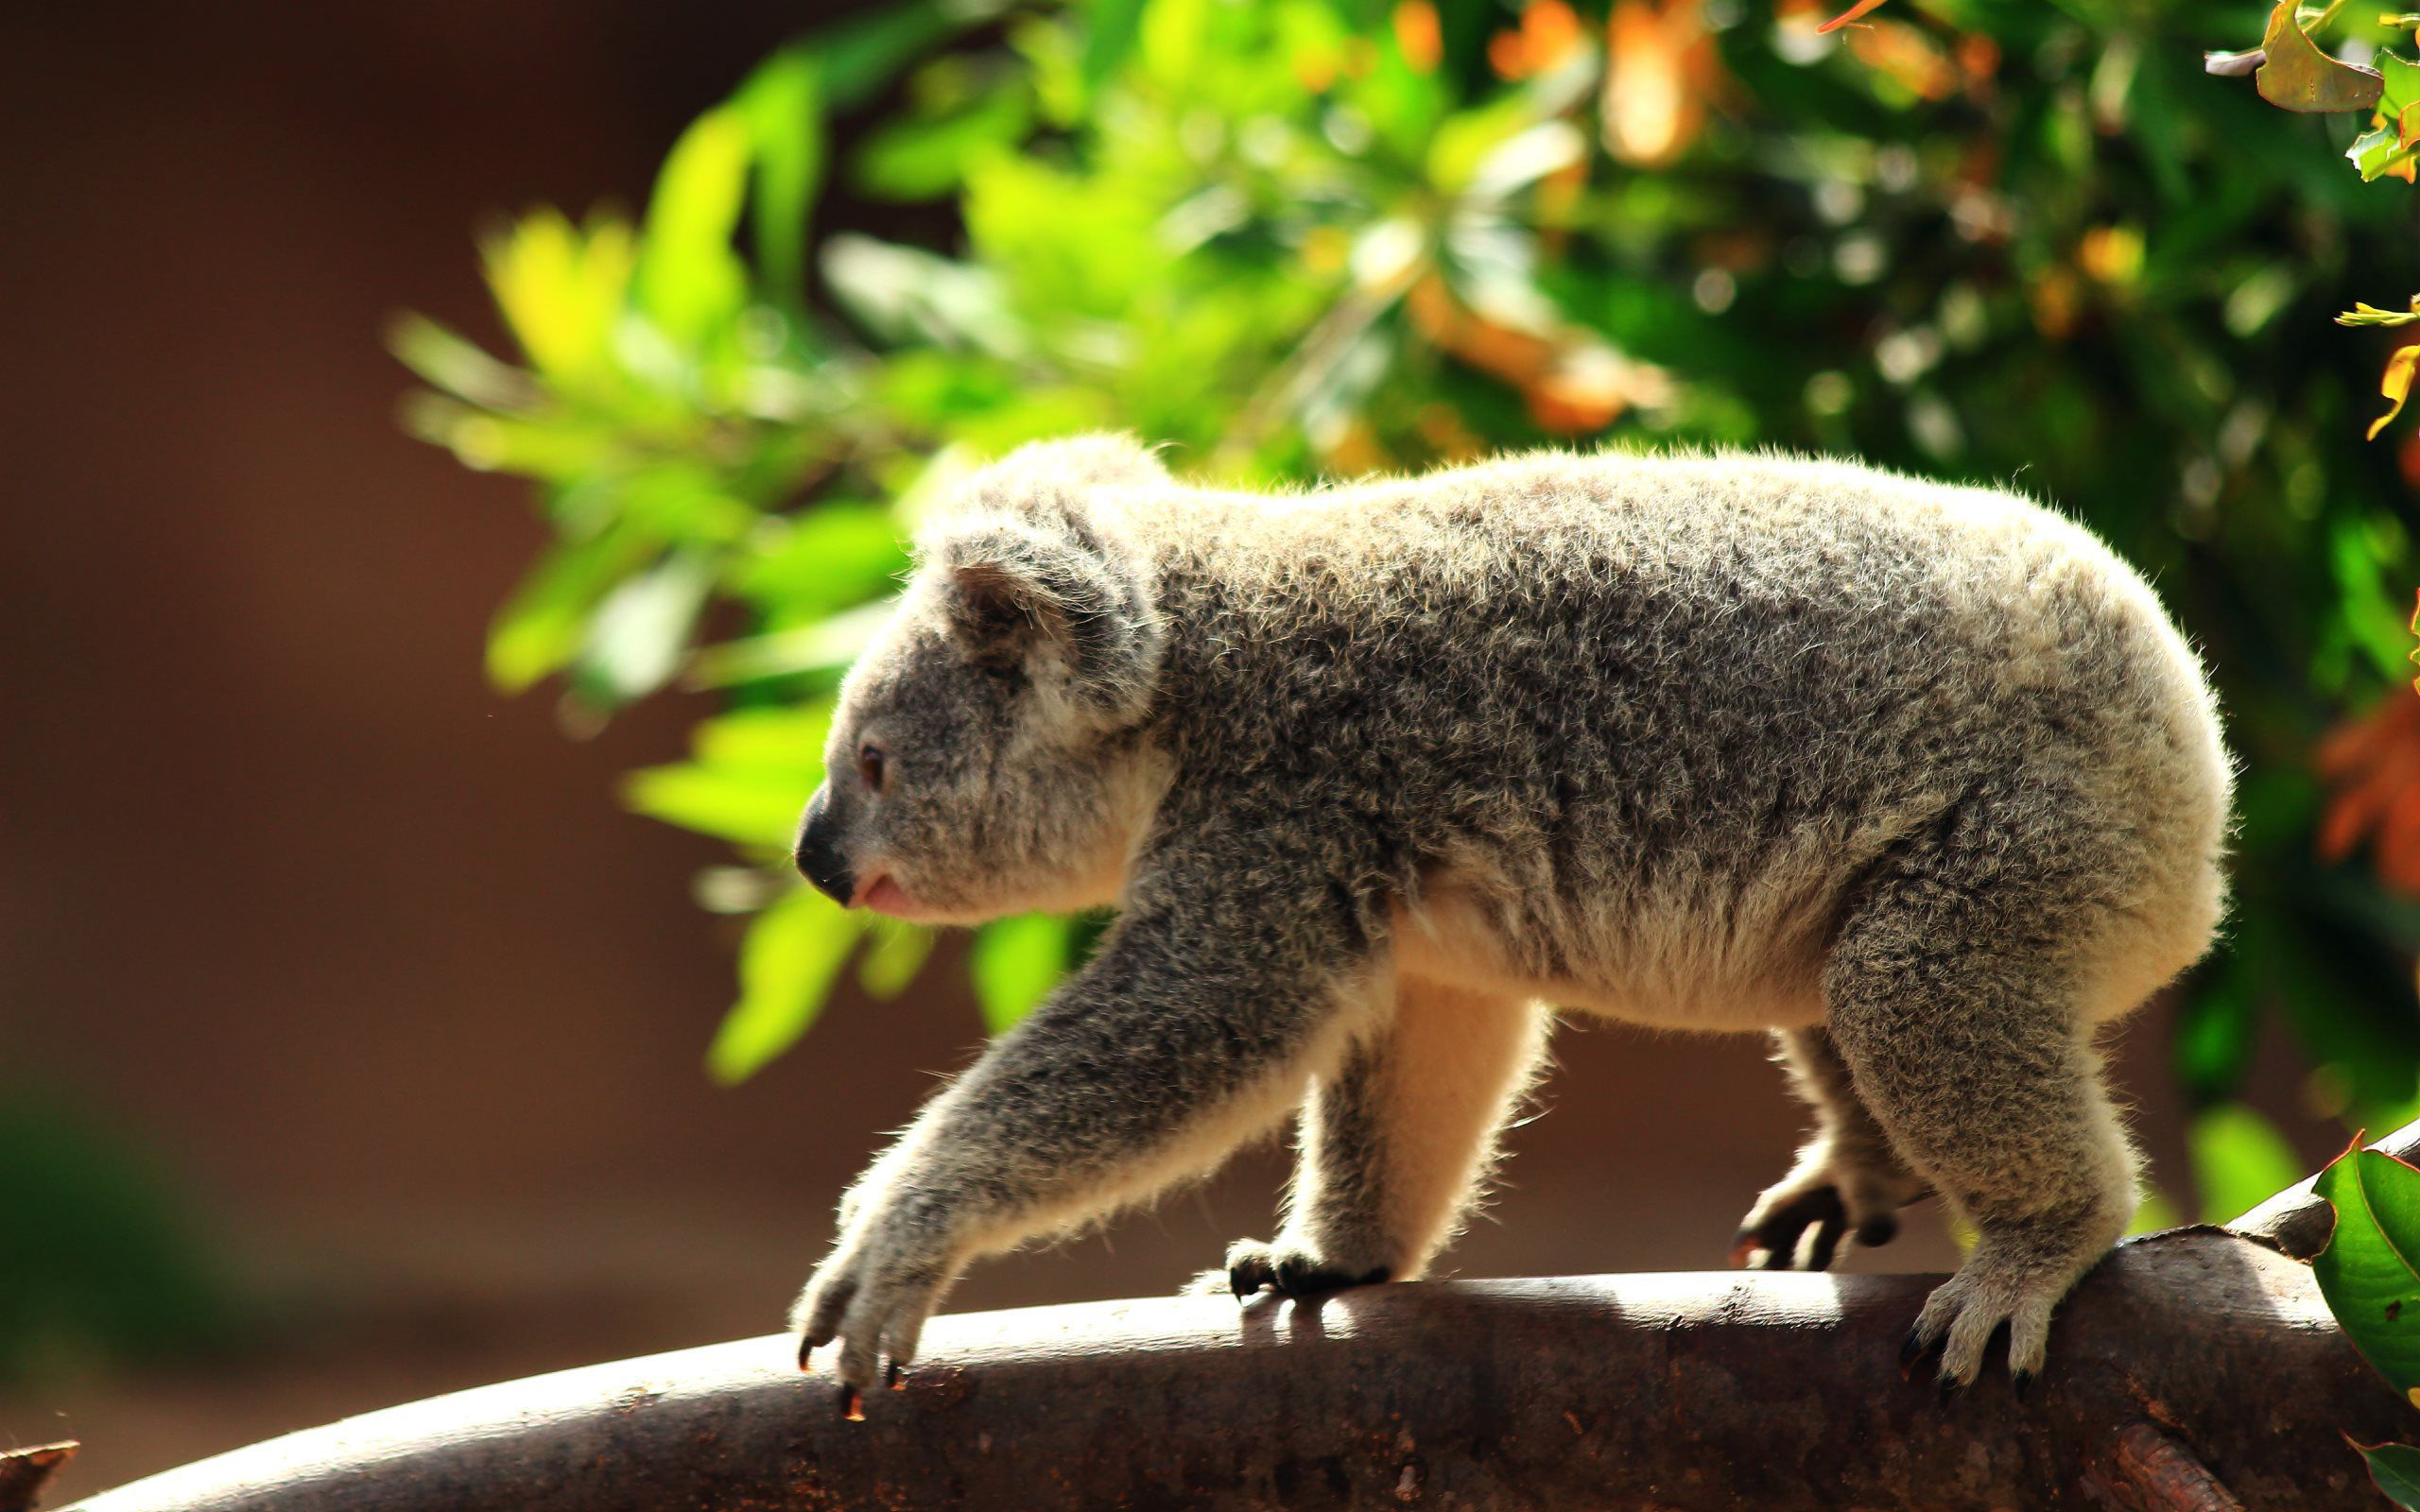 Koala Free Hd Wallpapers